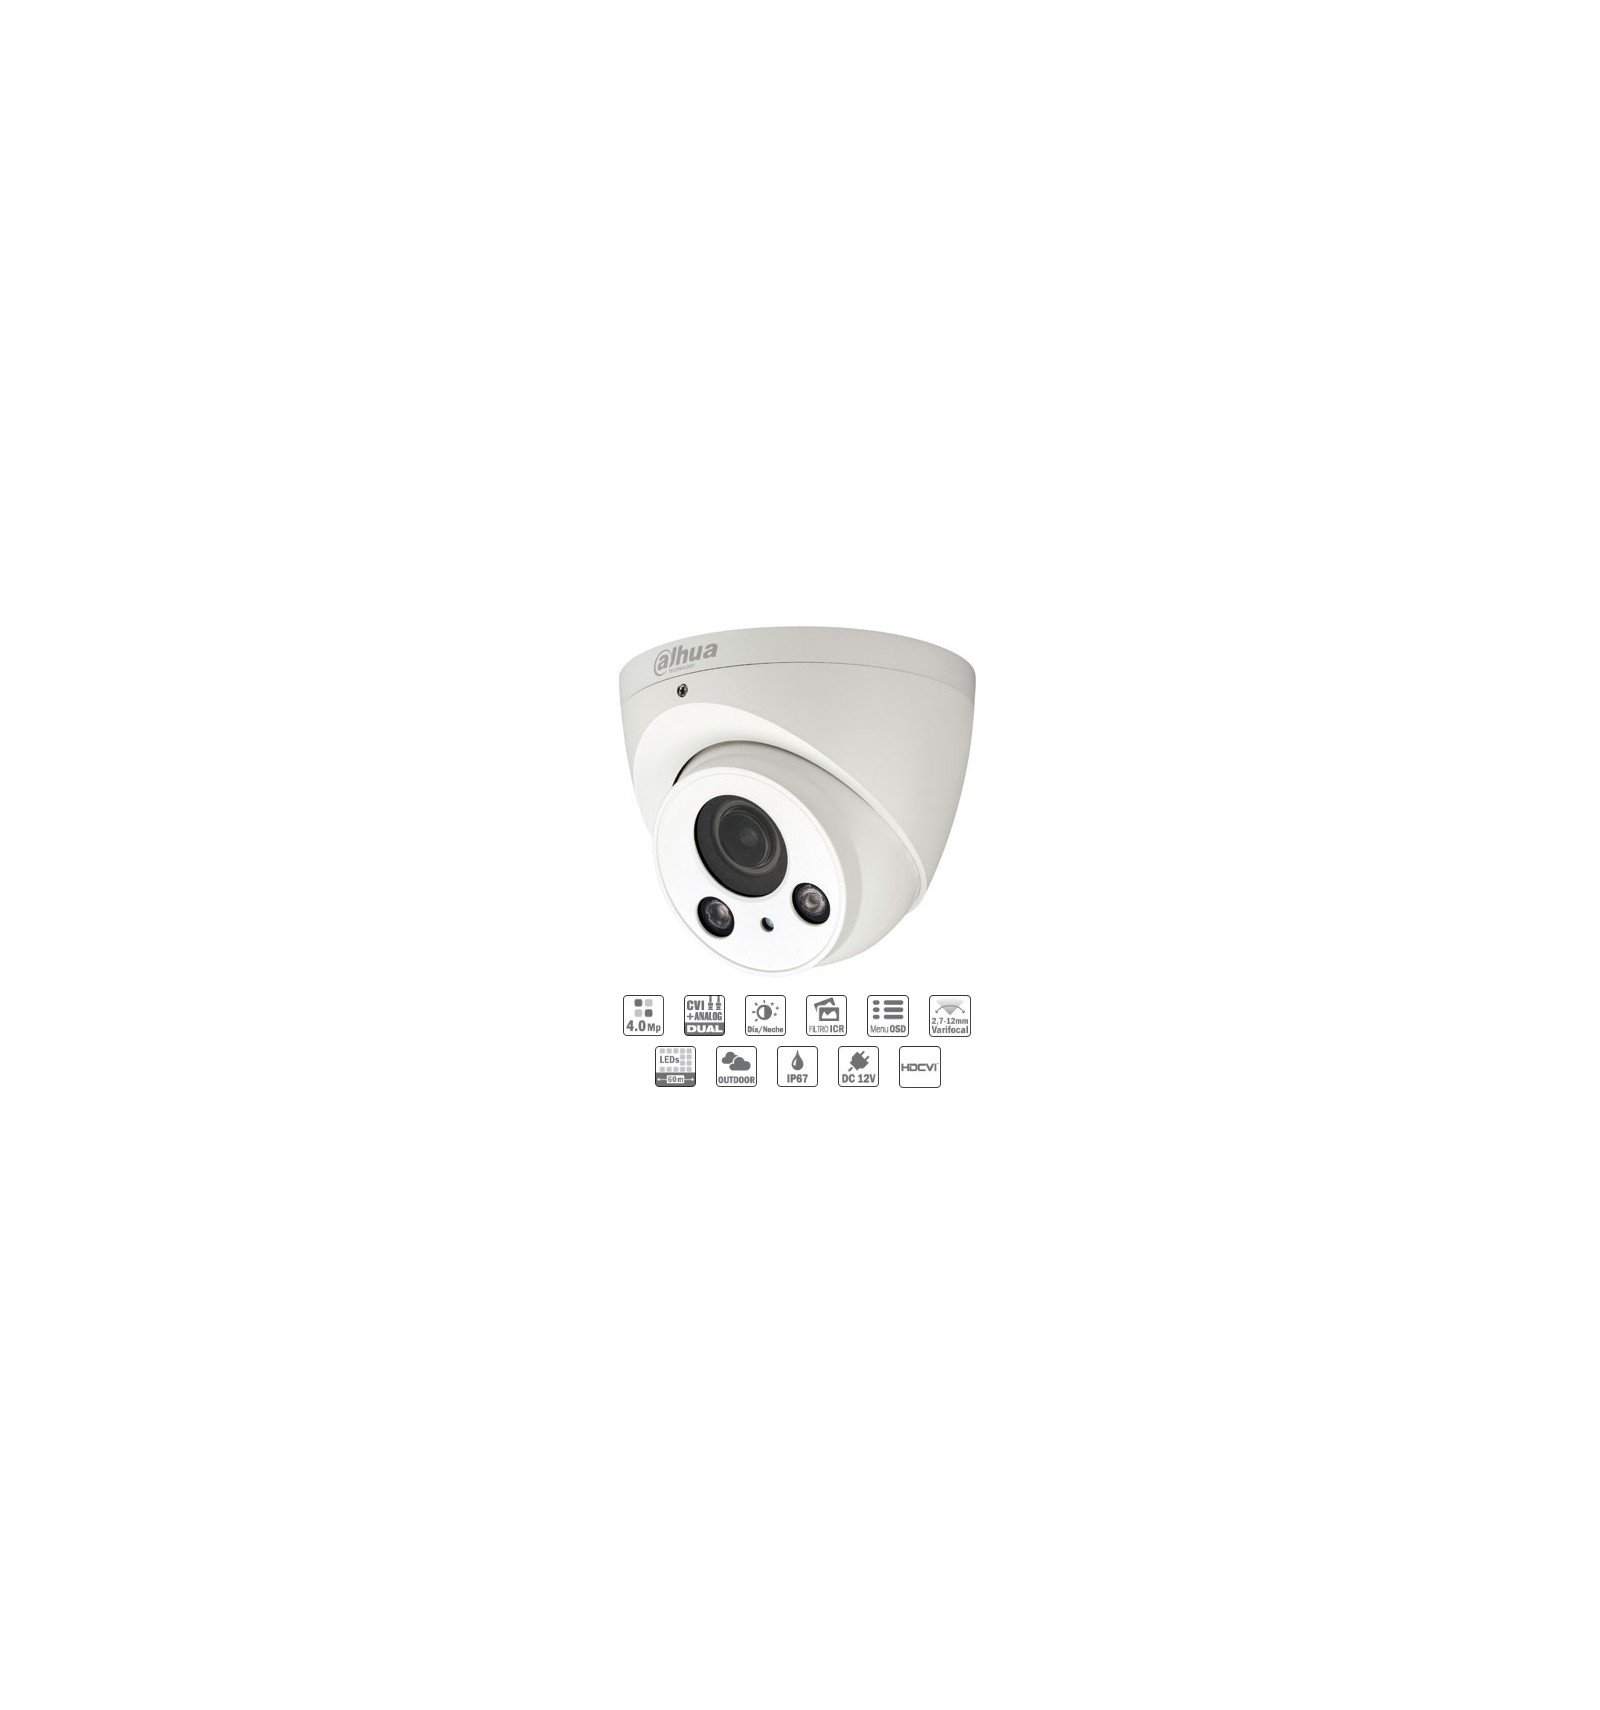 Camara de vigilancia exterior domo hdcvi 4 mp 60 metros for Camara vigilancia exterior